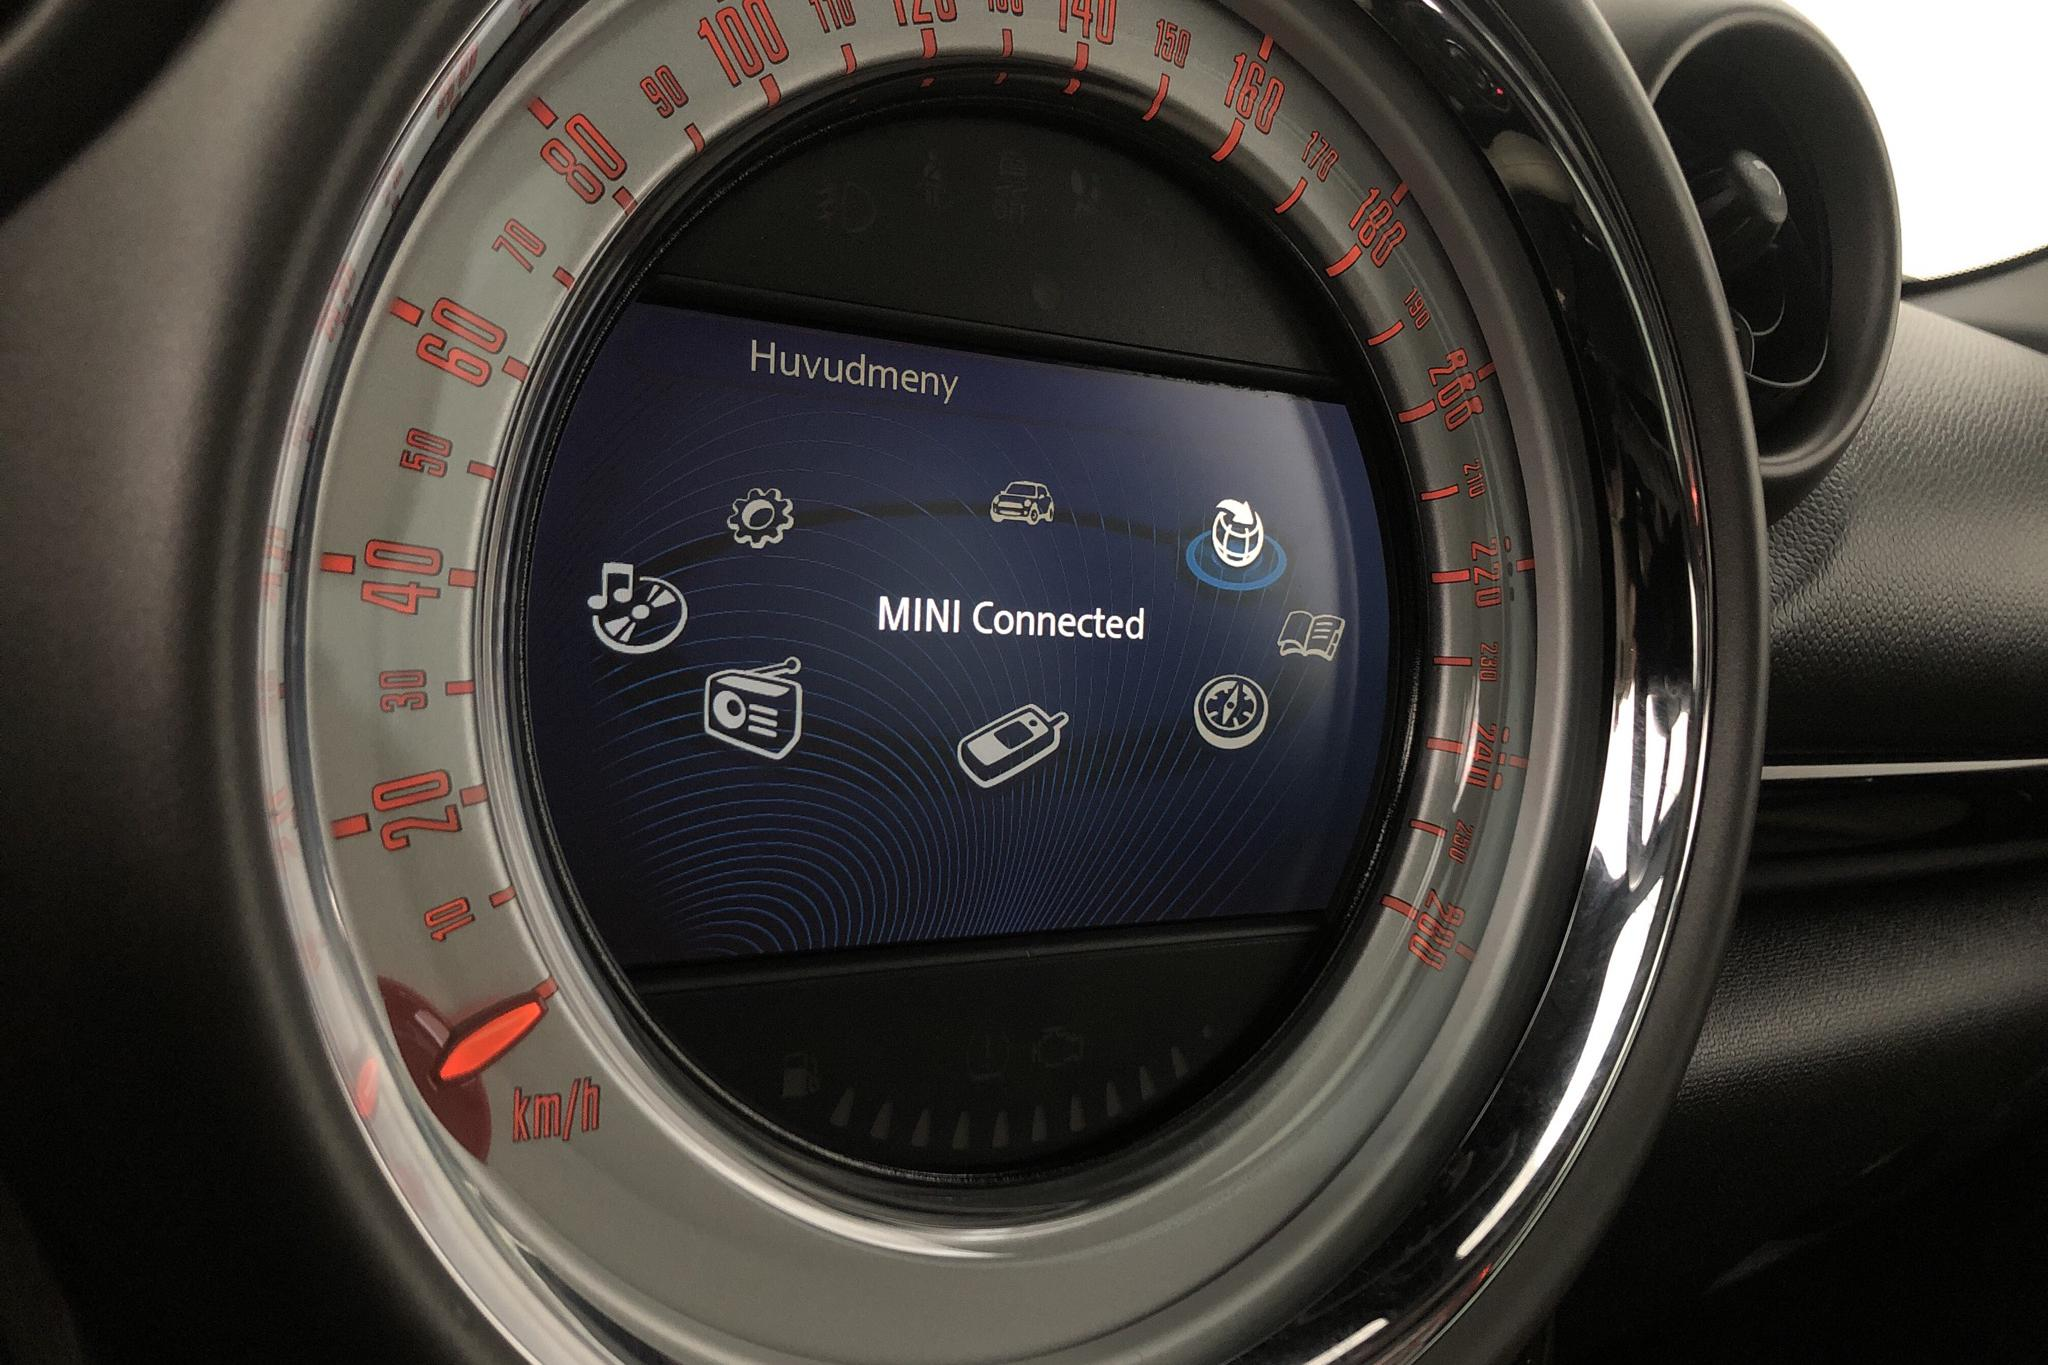 MINI Cooper Countryman (122hk) - 159 680 km - Automatic - black - 2011